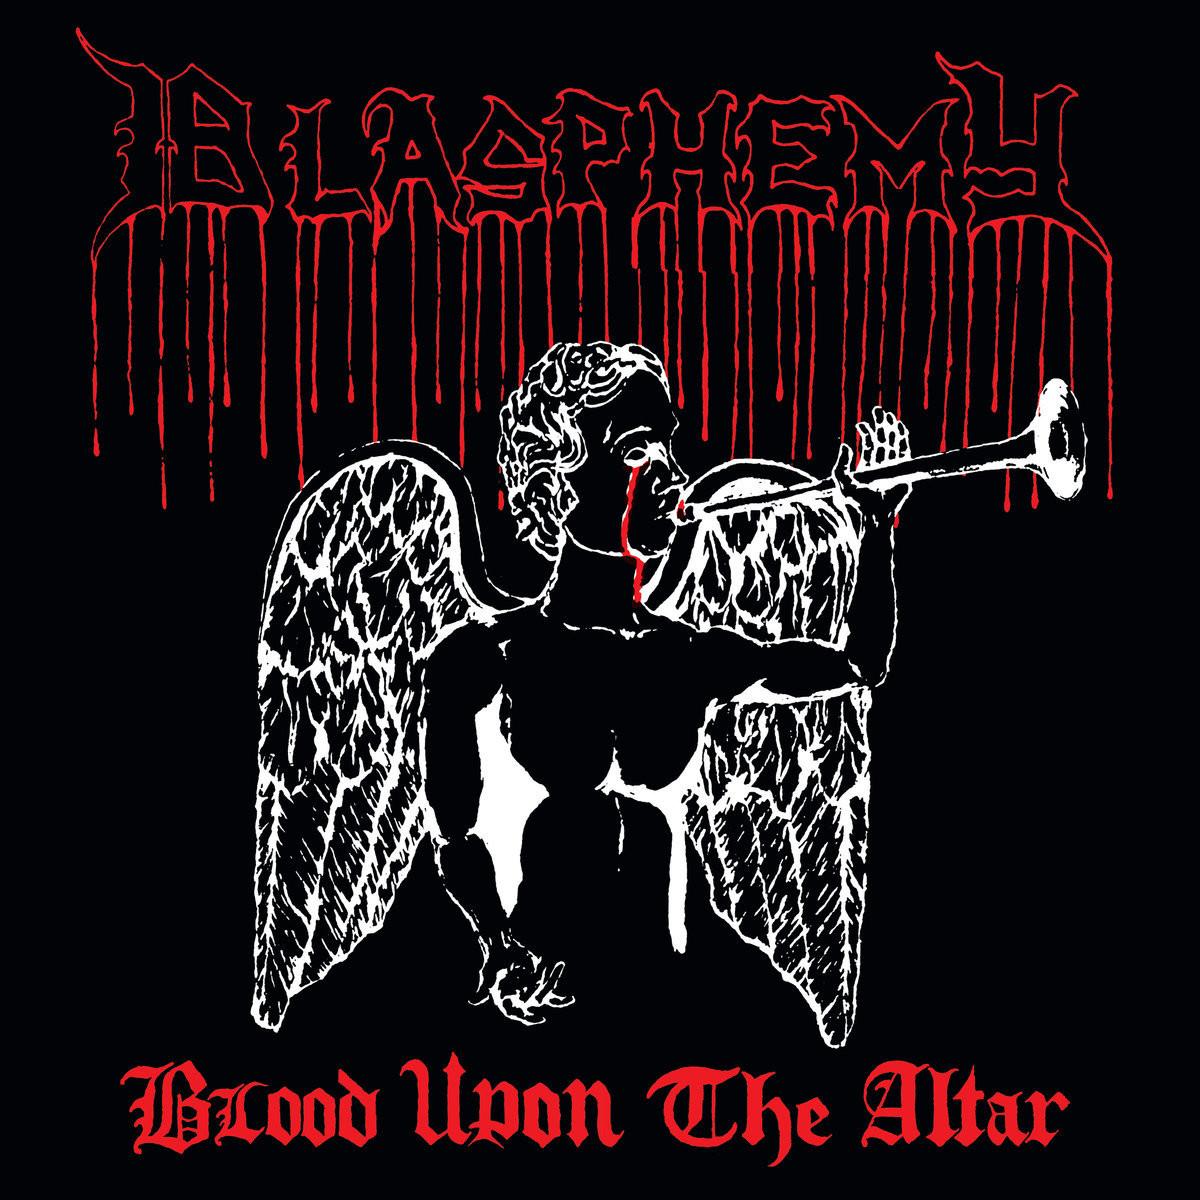 Blasphemy - Blood on the Altar